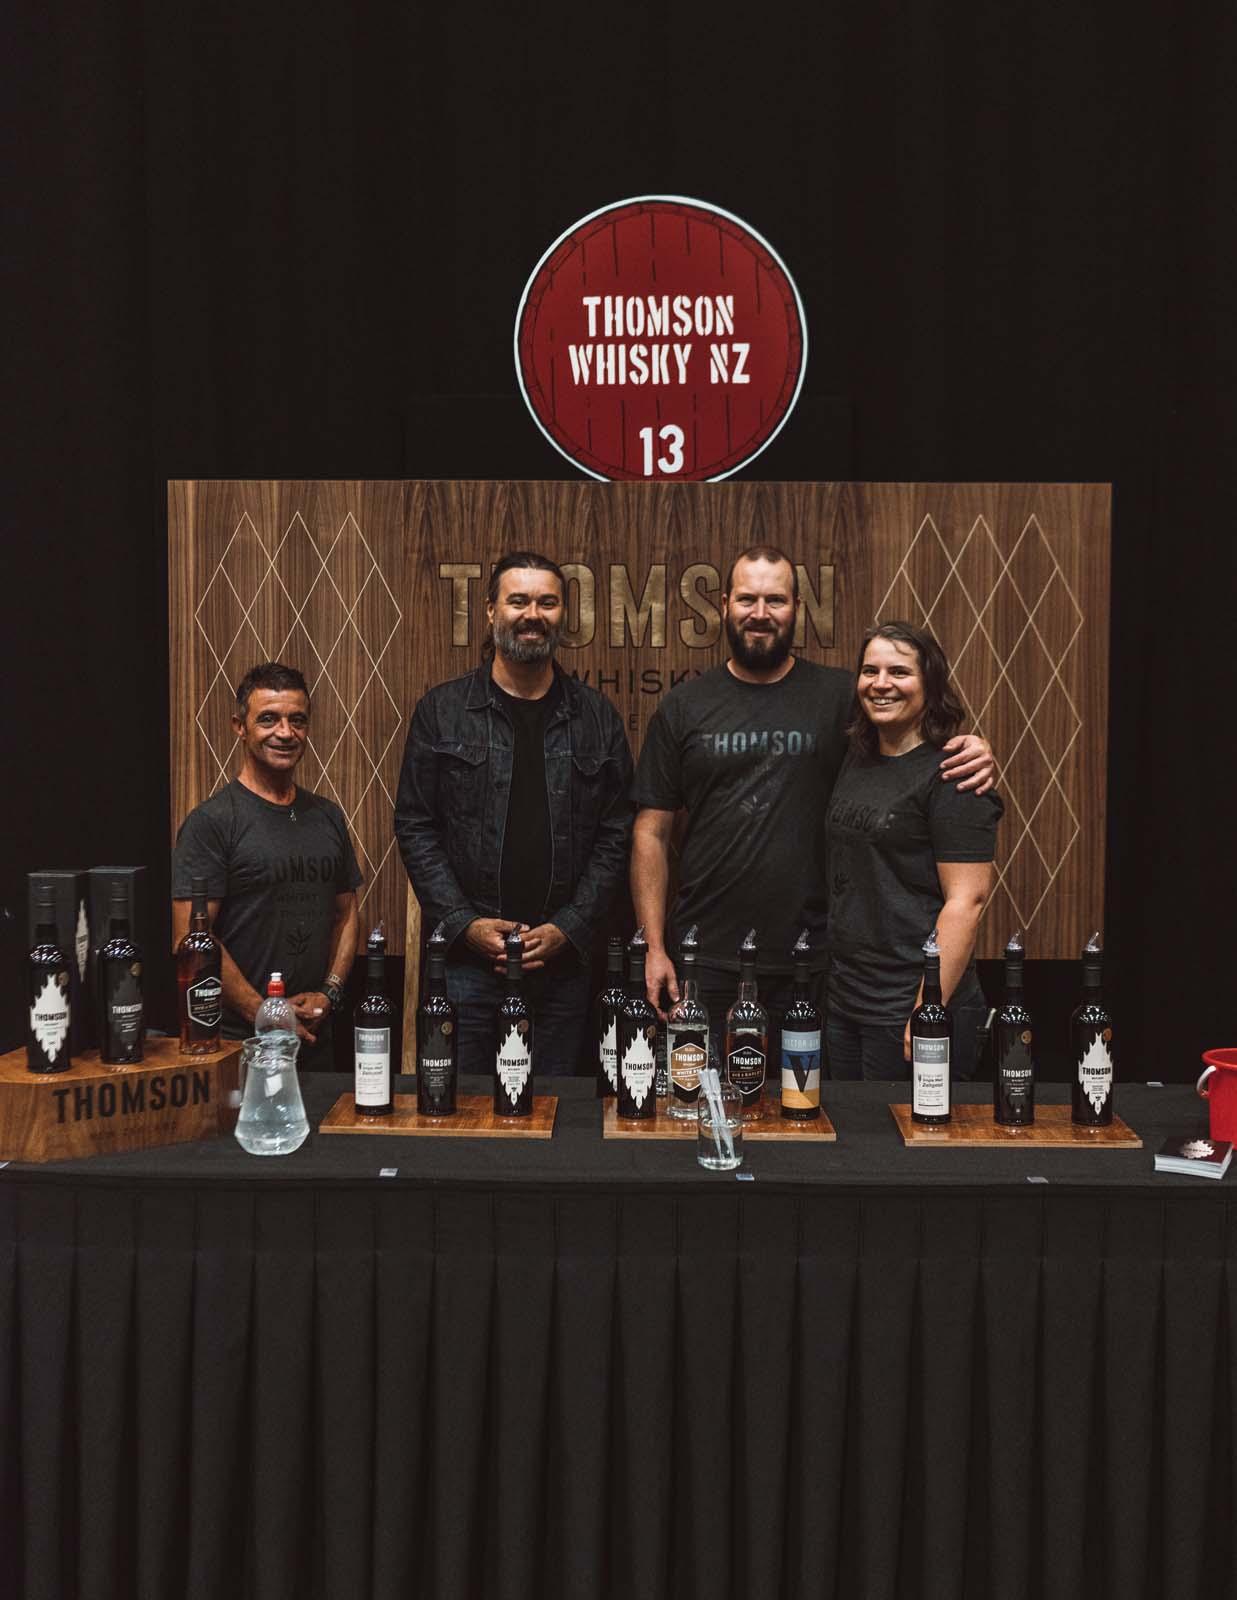 Dramfest 2018 for Whisky Galore-189.jpg